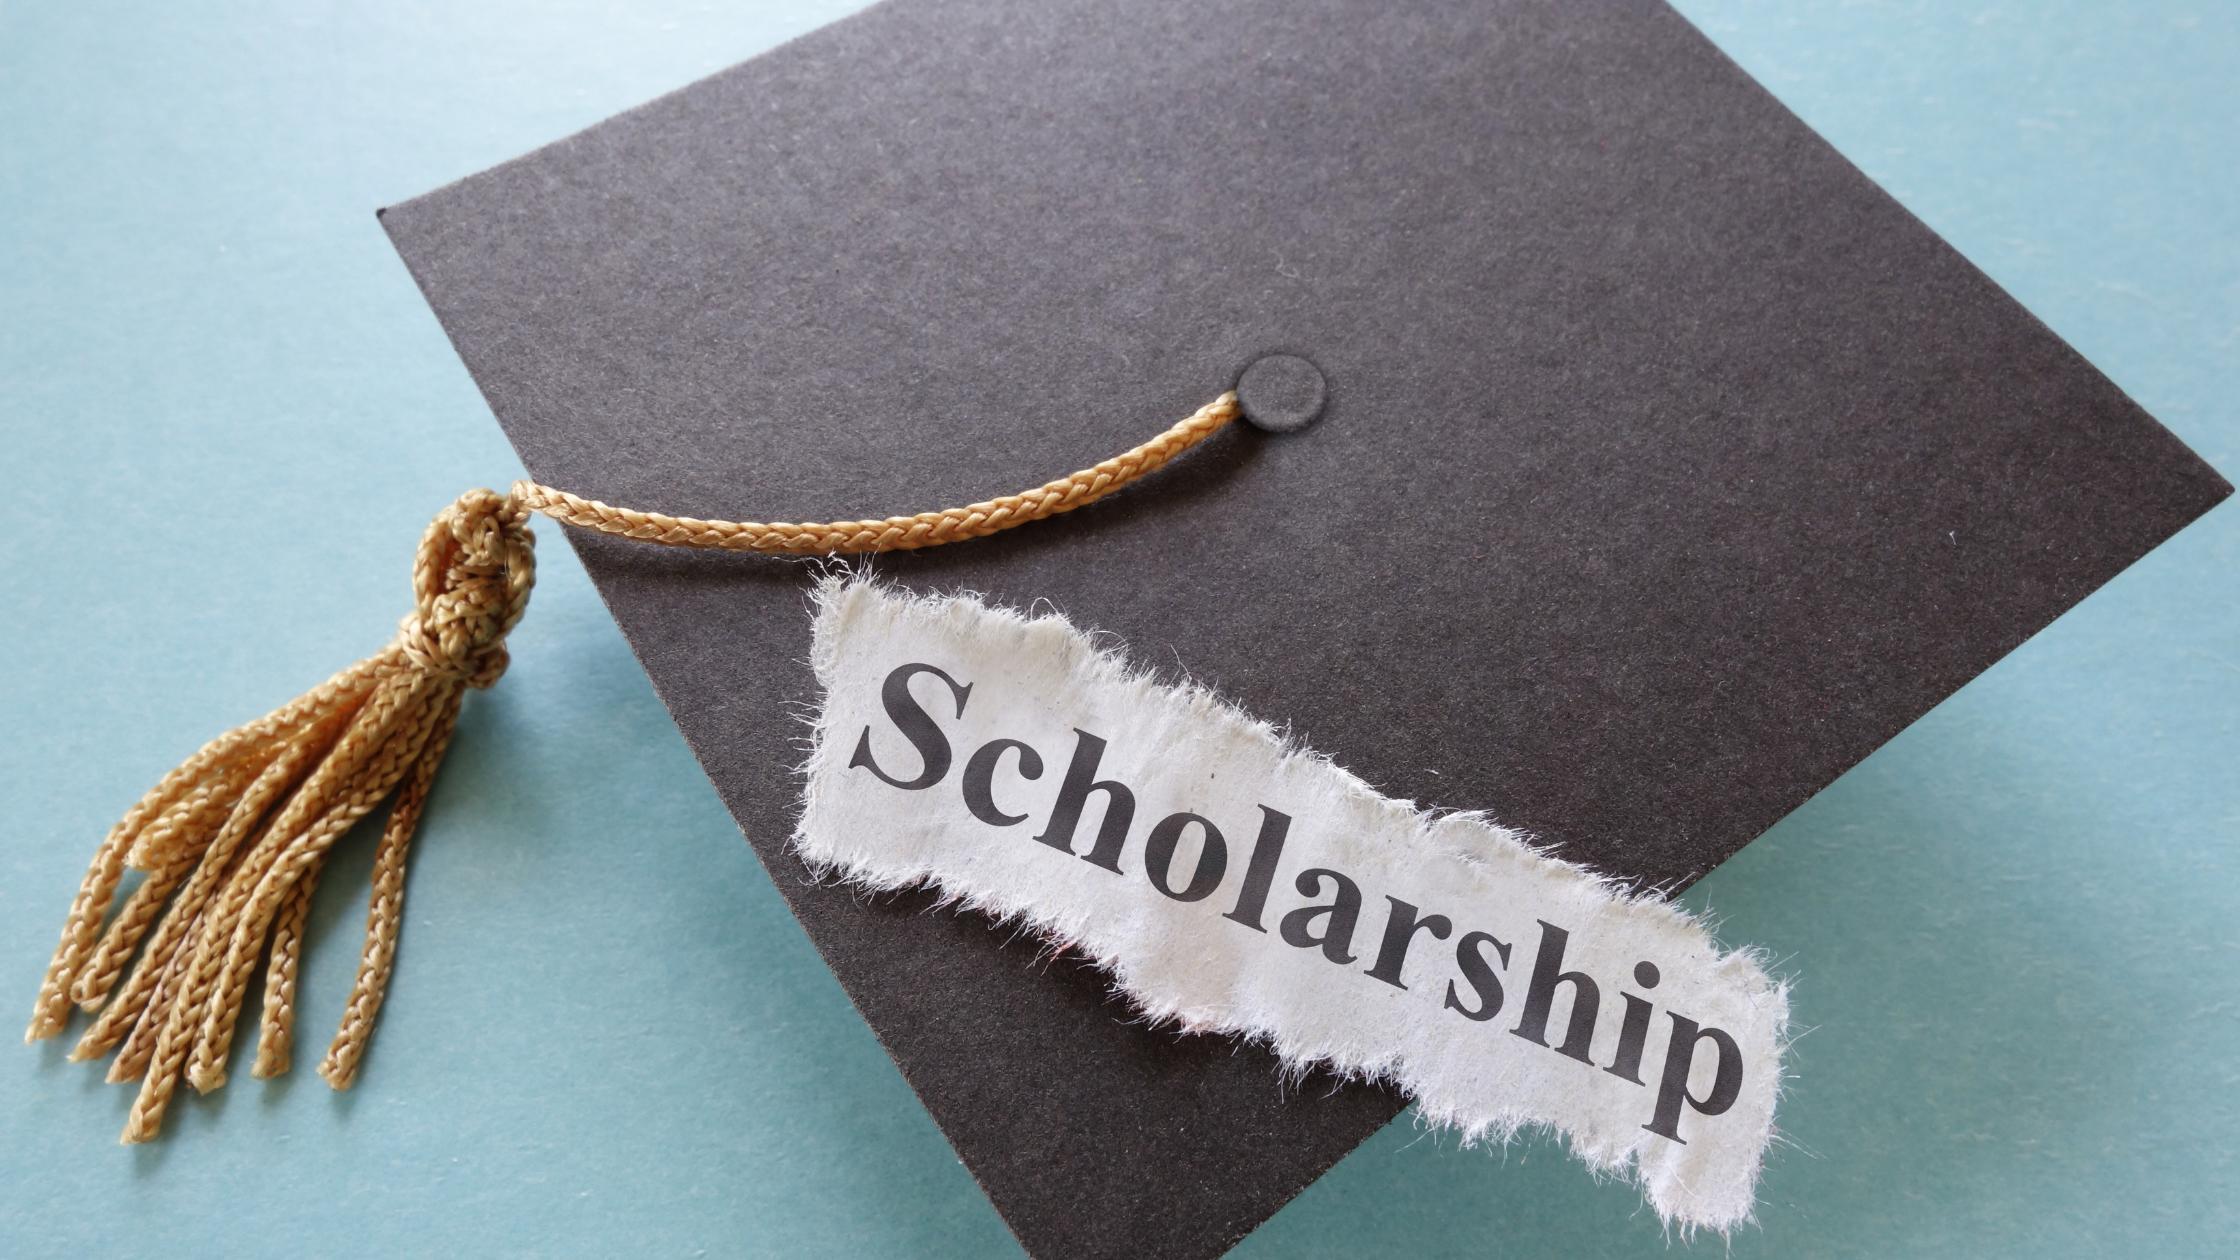 The Benjy Grinberg Scholarship is Open to High School Seniors